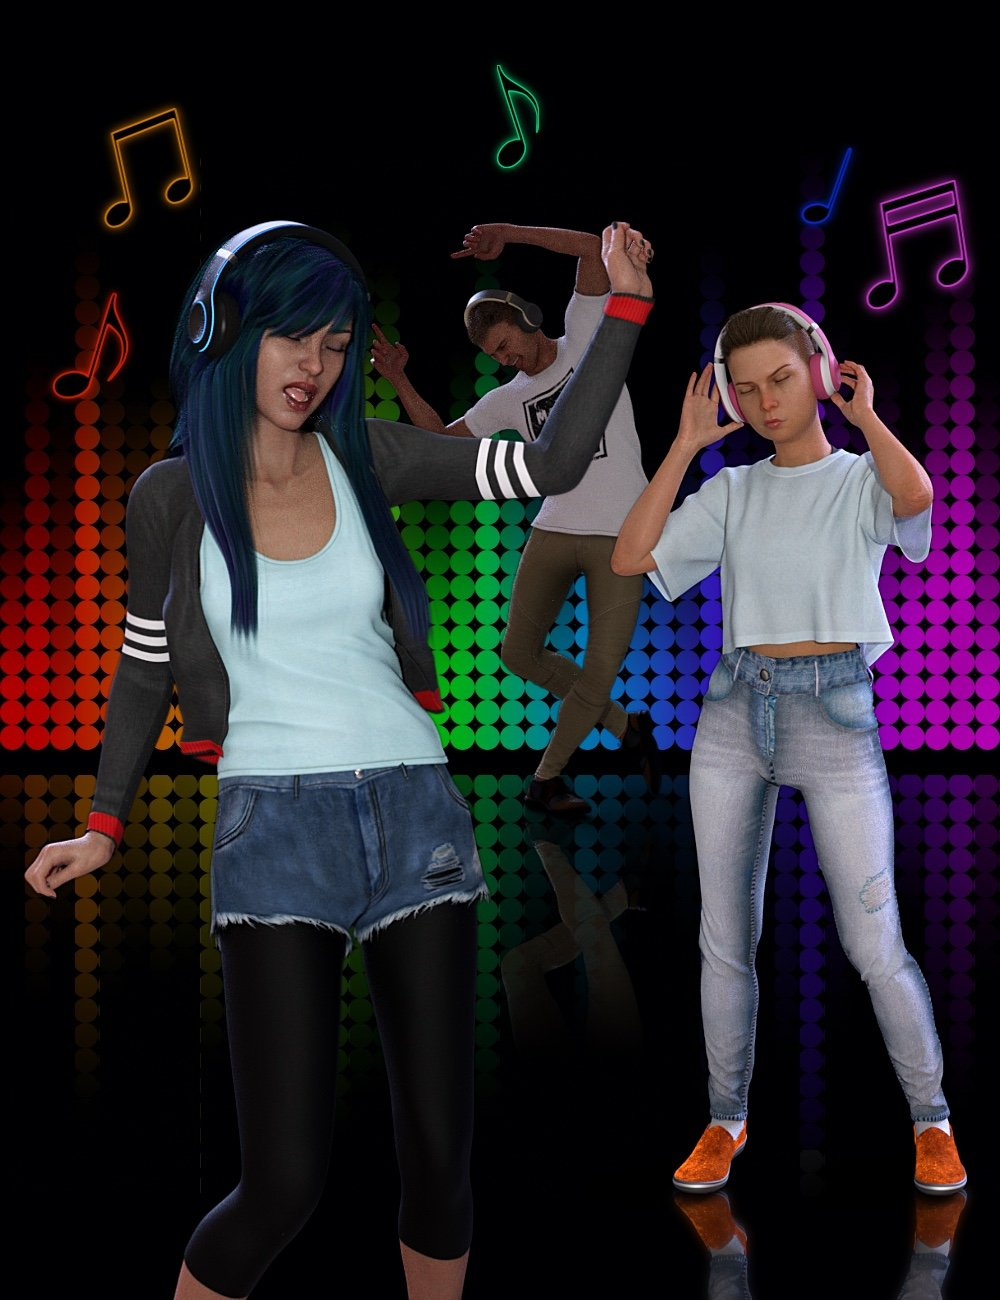 Dance 2 the Music by: NewGuy, 3D Models by Daz 3D